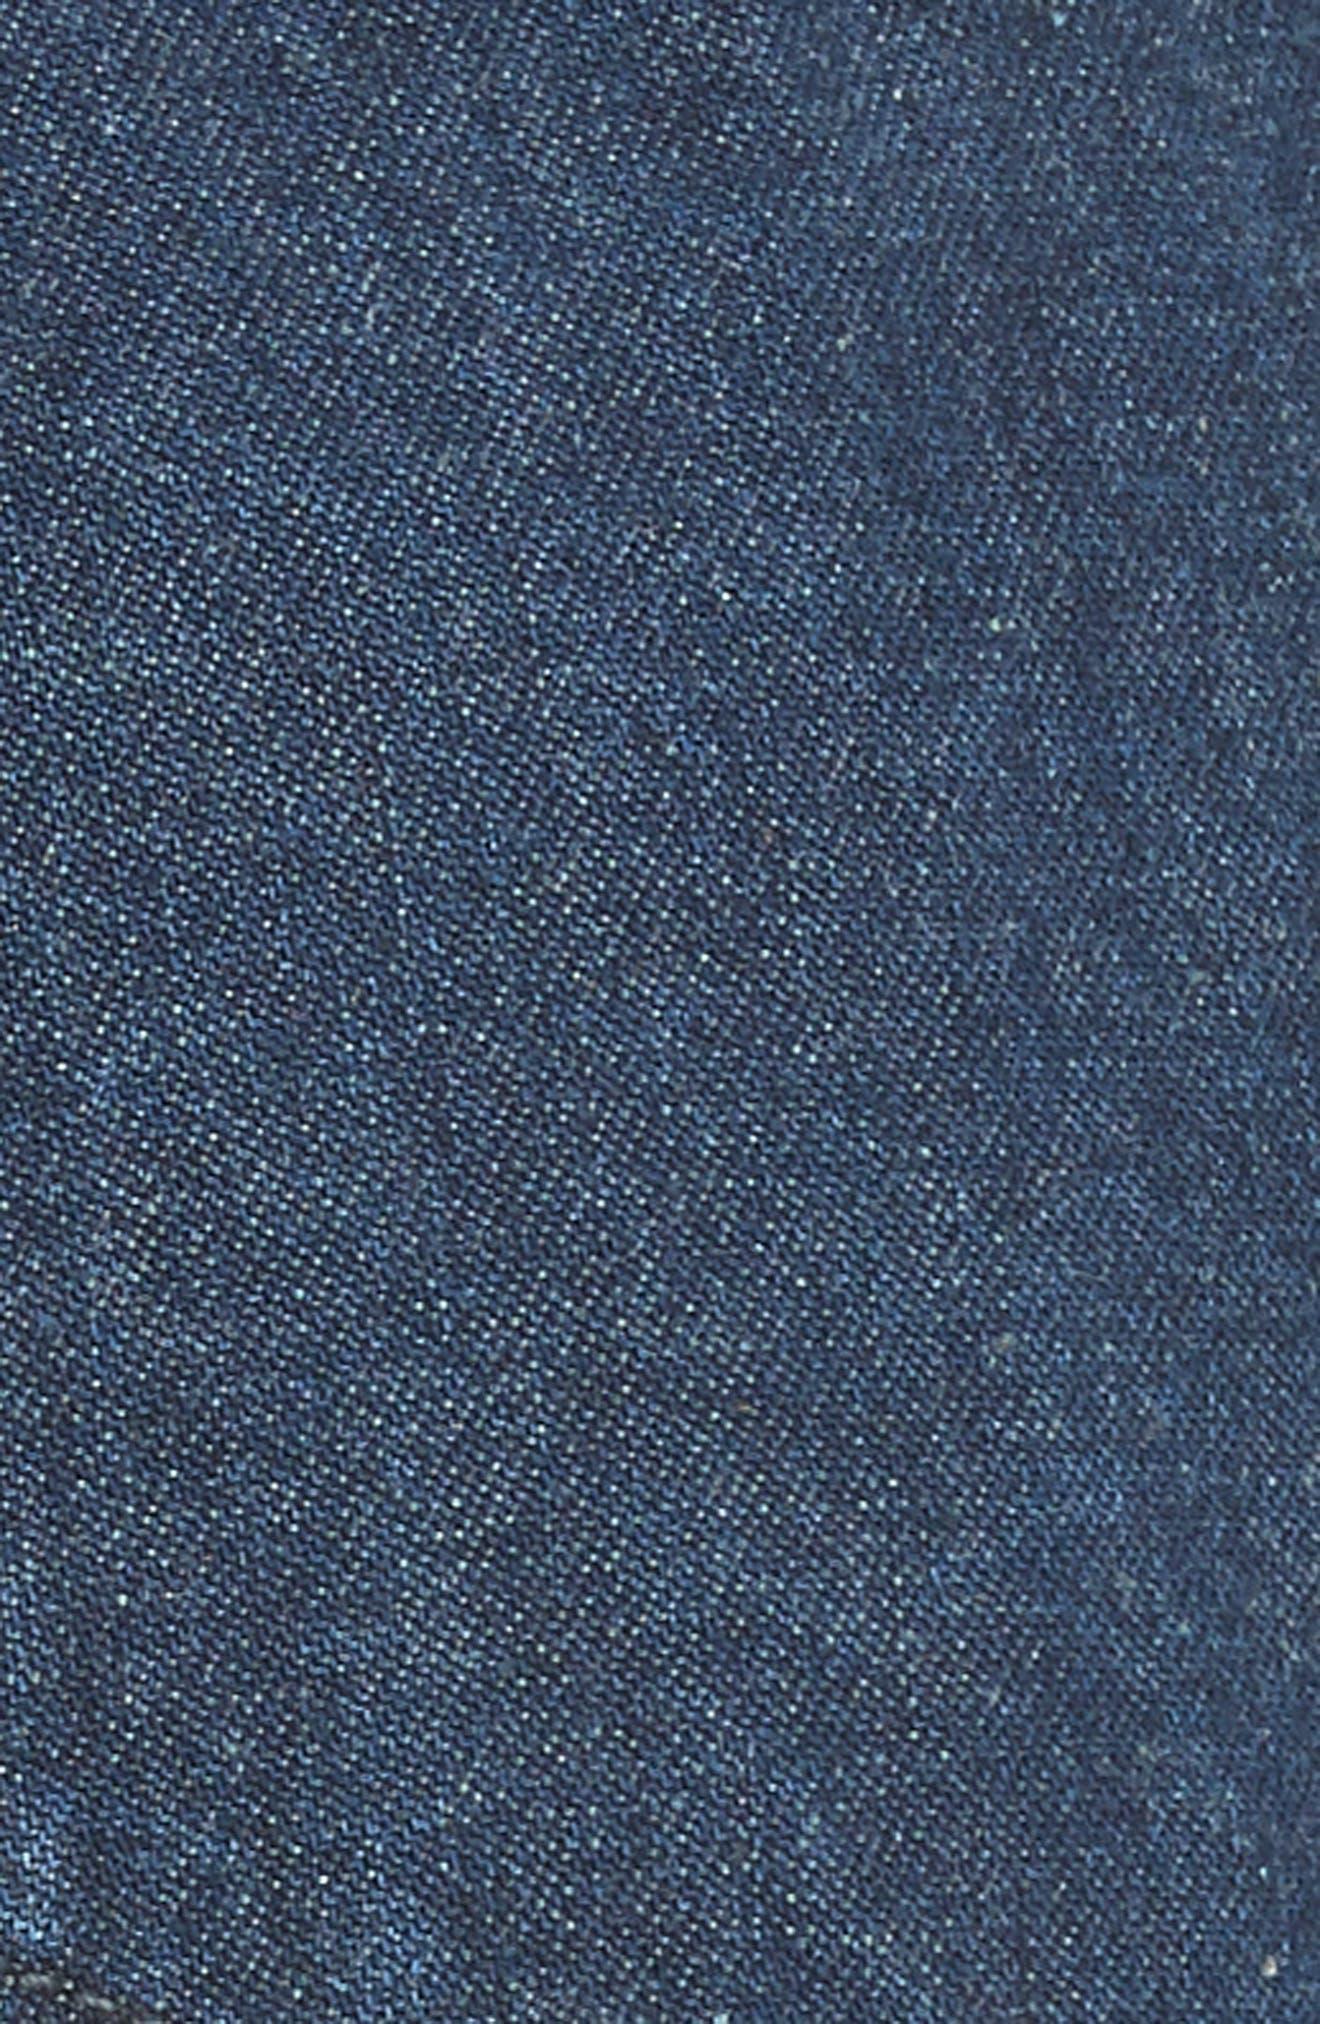 Sailor Denim Shorts,                             Alternate thumbnail 5, color,                             Ultra Marine Wash